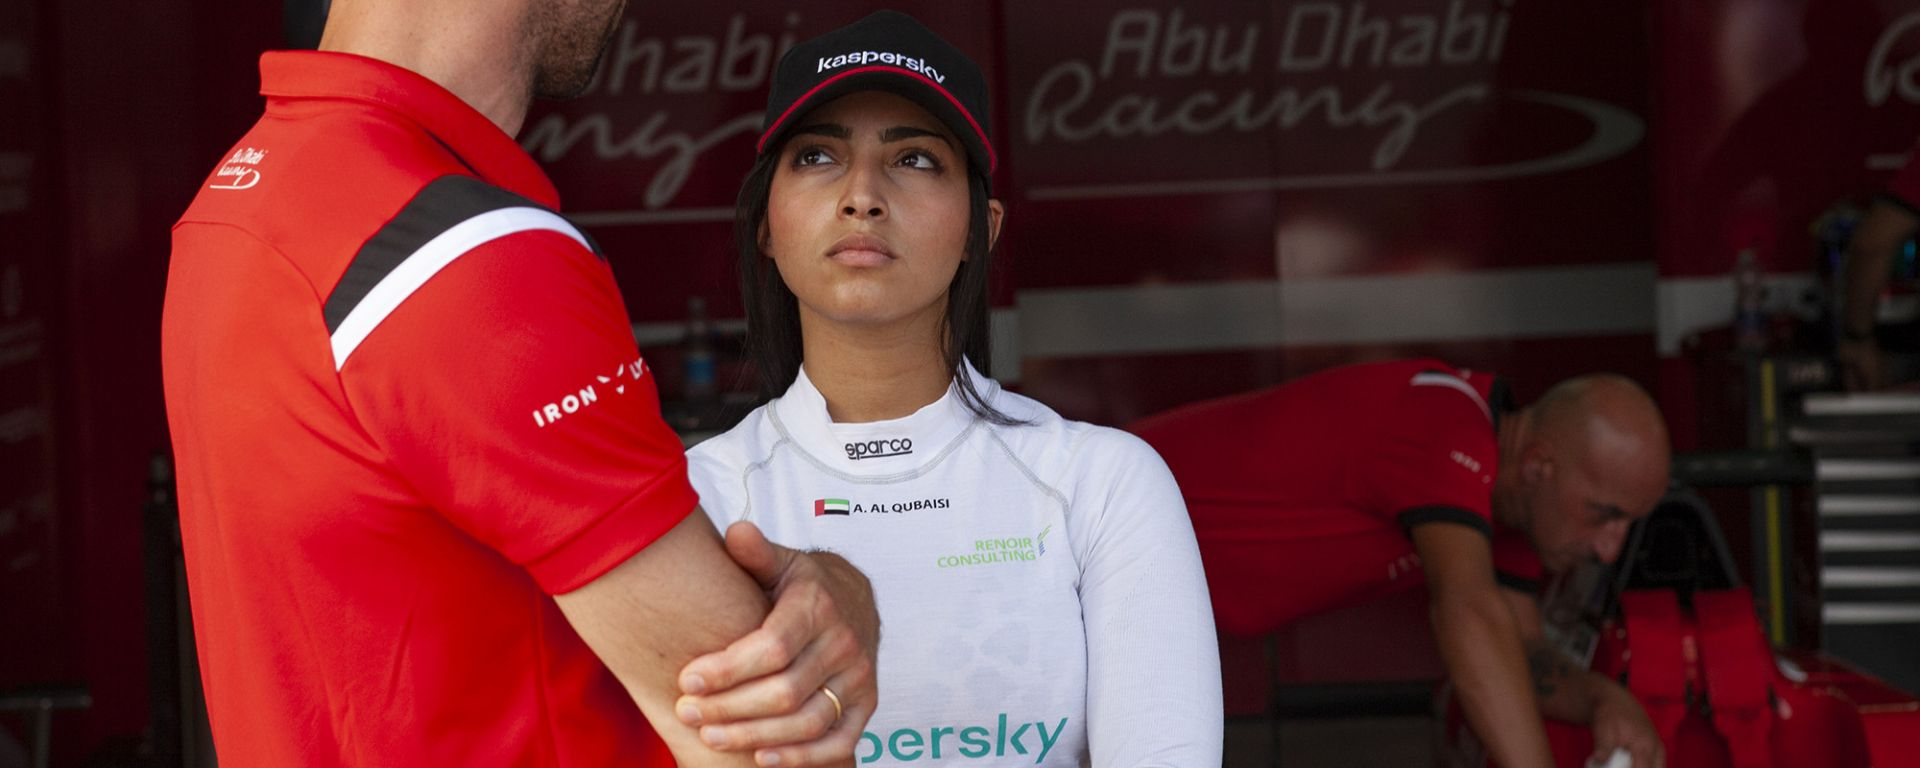 La prima pilota araba: l'intervista ad Amna Al Qubaisi